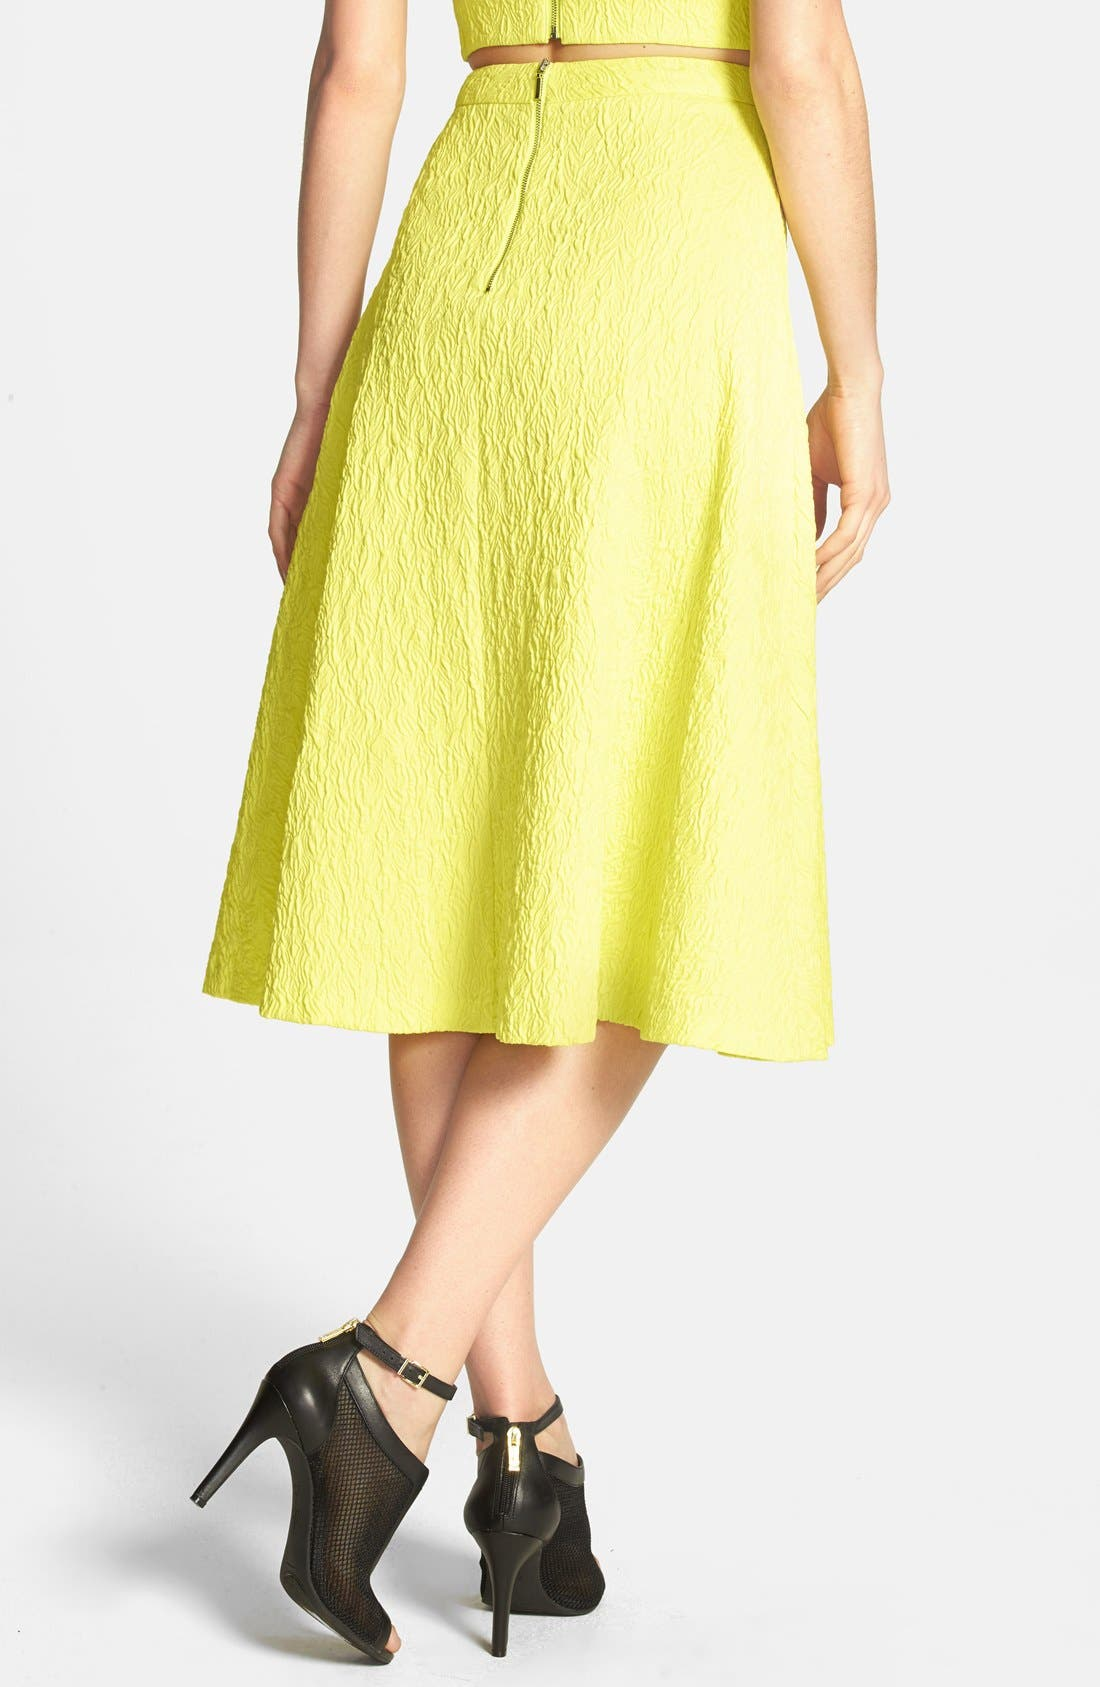 JOA Textured A-Line Midi Skirt,                             Alternate thumbnail 2, color,                             Lemon